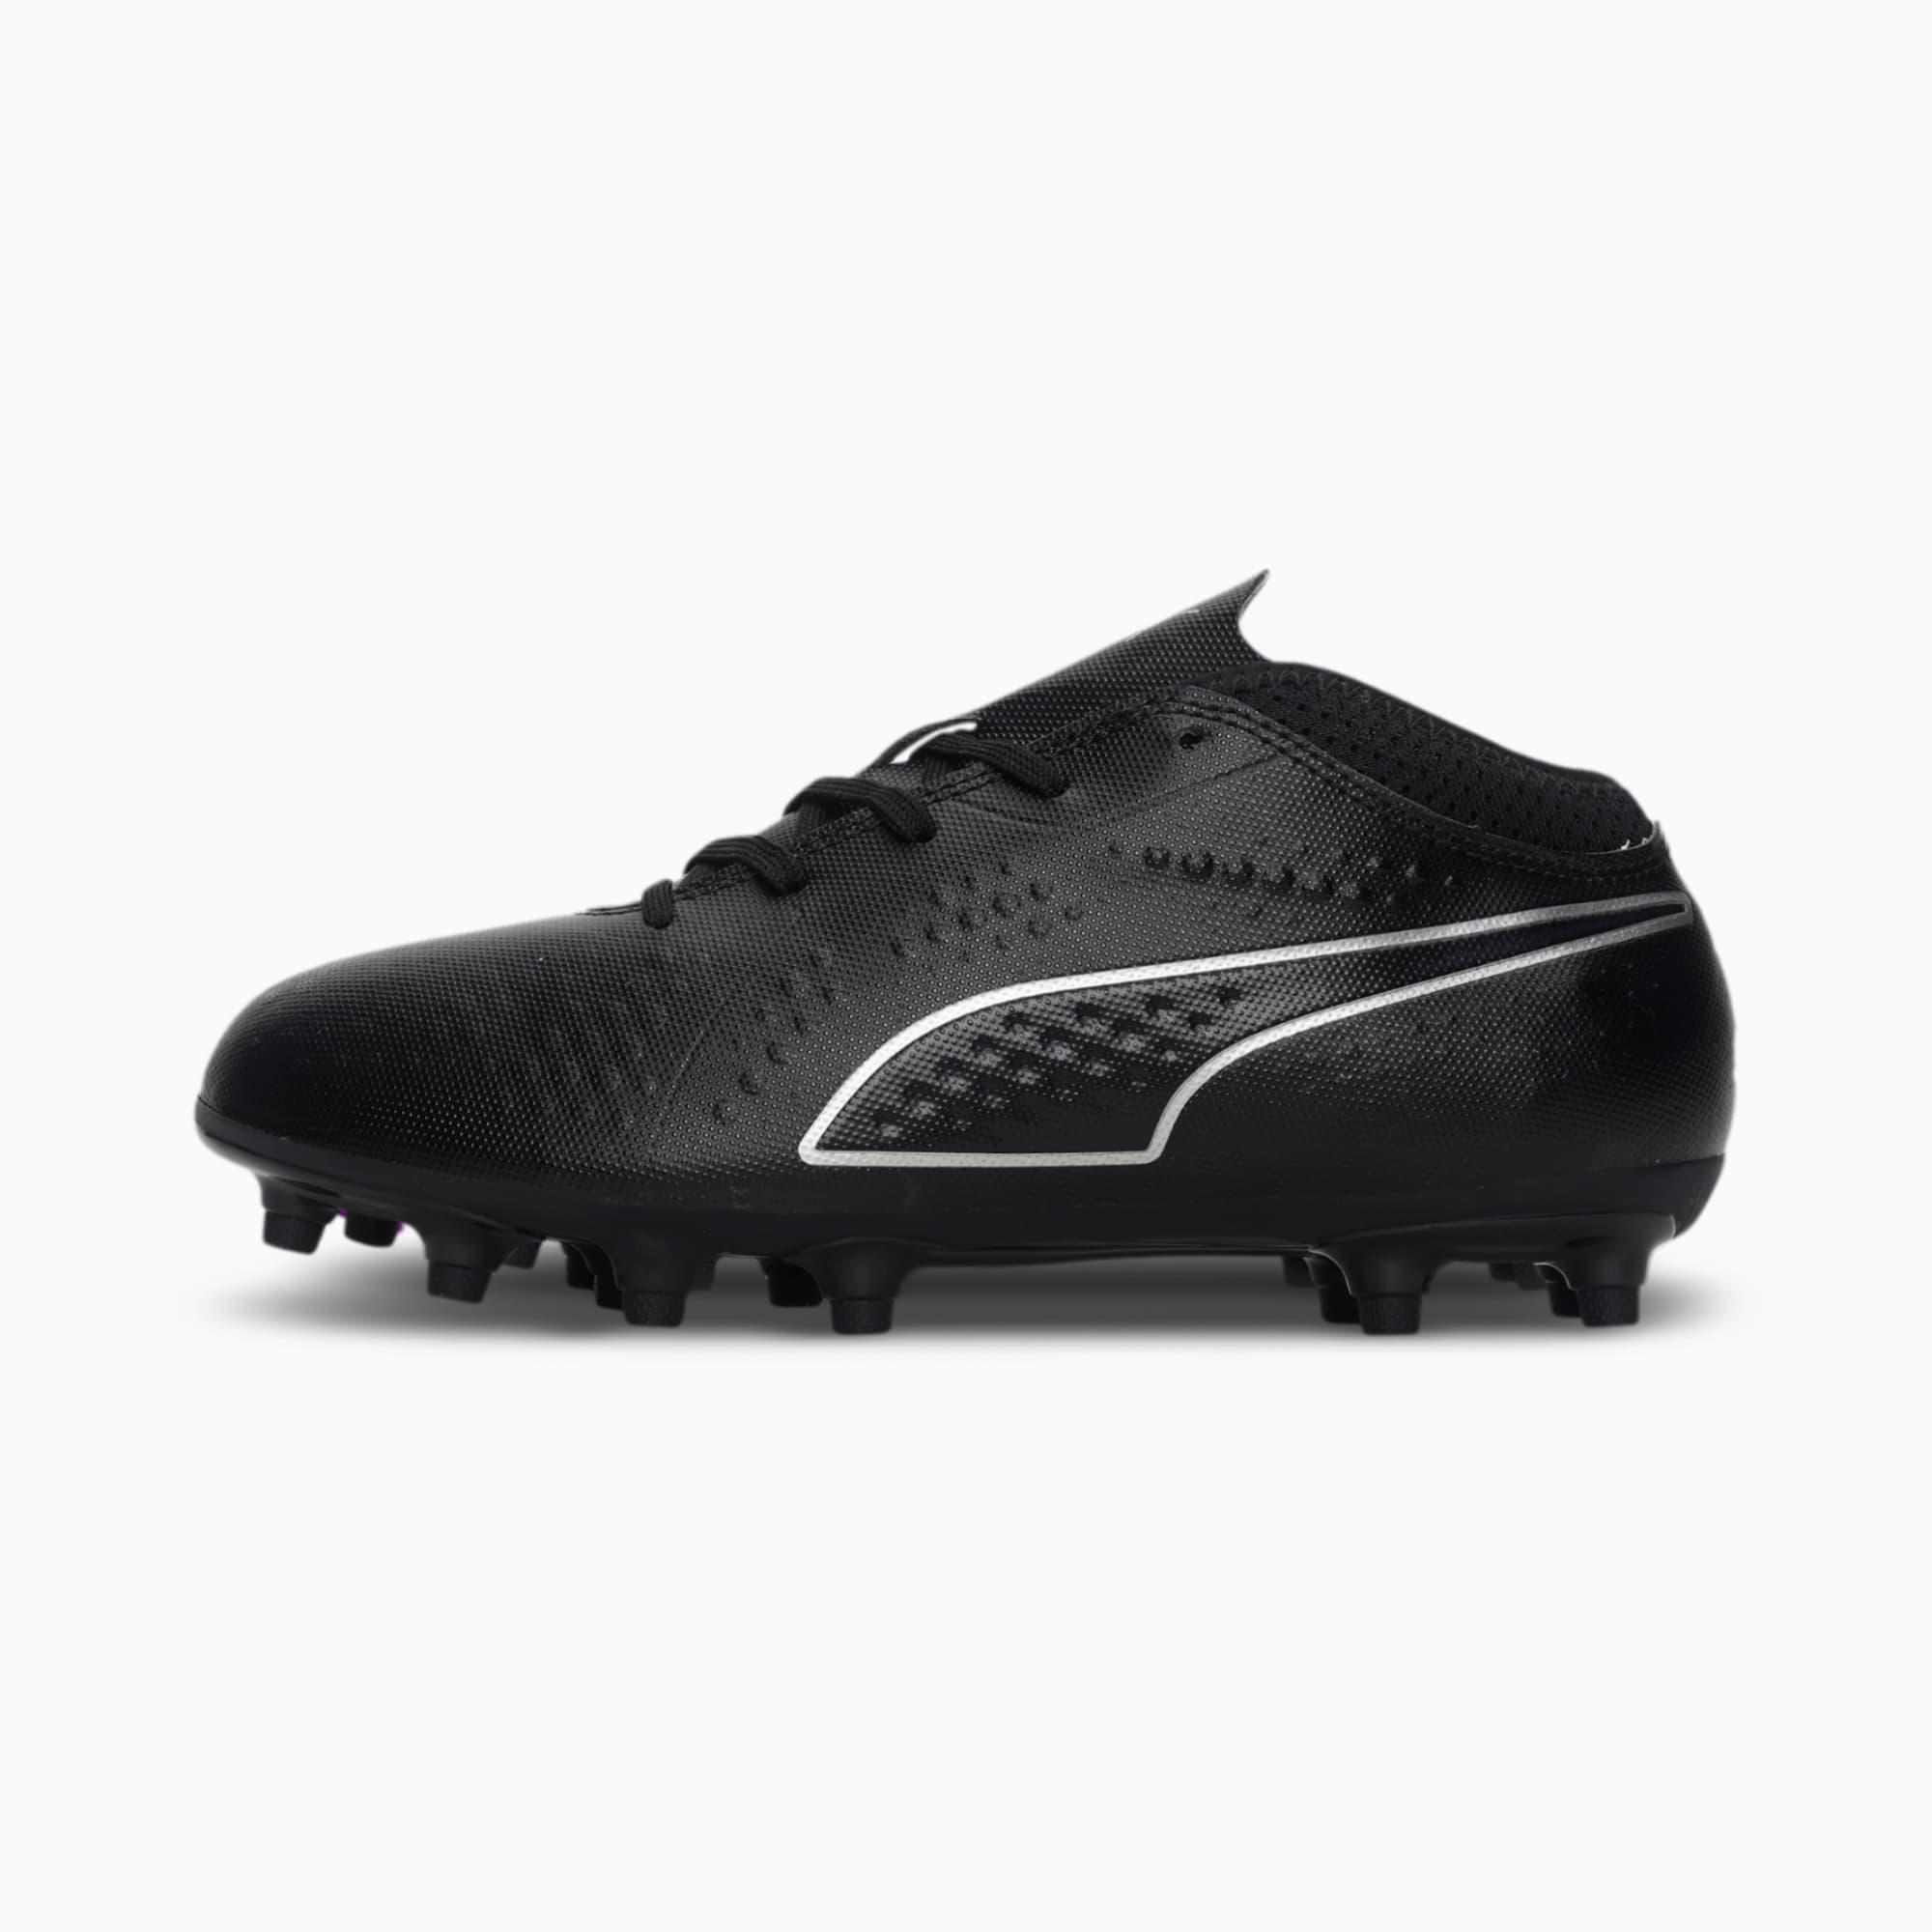 PUMA ONE 4 Synthetic FG Kids' Football Boots | Black-Black-Black | PUMA  sporthood | PUMA